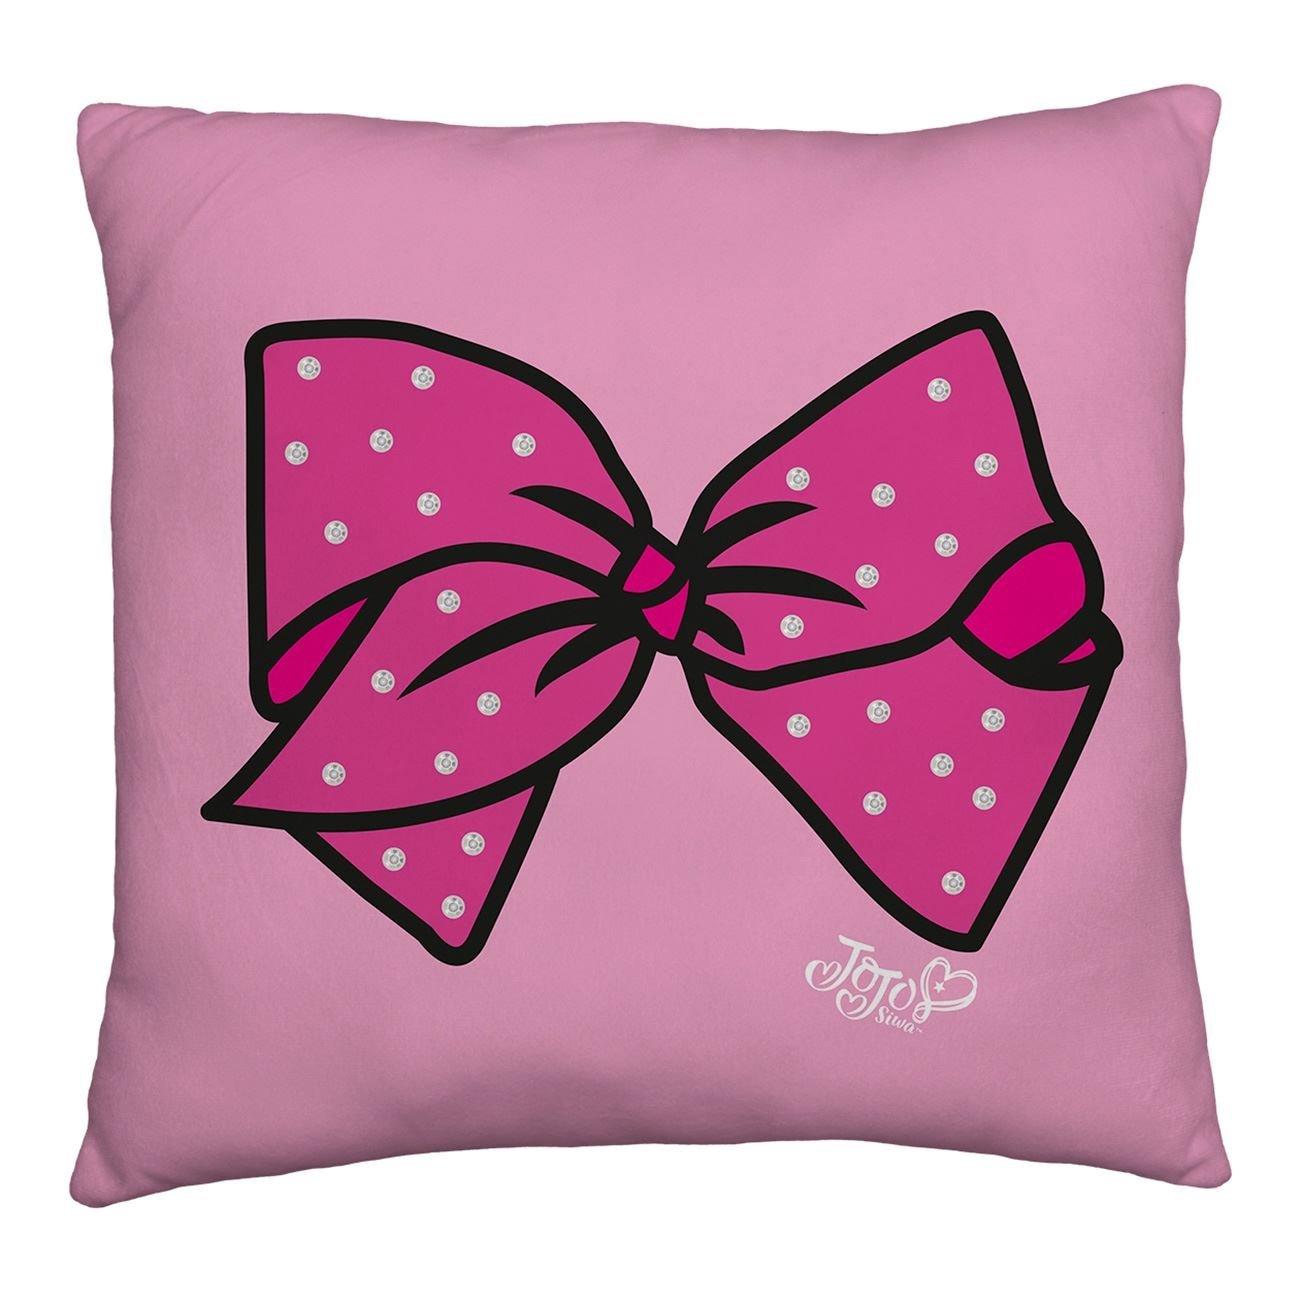 neu jojo siwa gro e schleife kissen m dchen kinder ventilator pink ebay. Black Bedroom Furniture Sets. Home Design Ideas